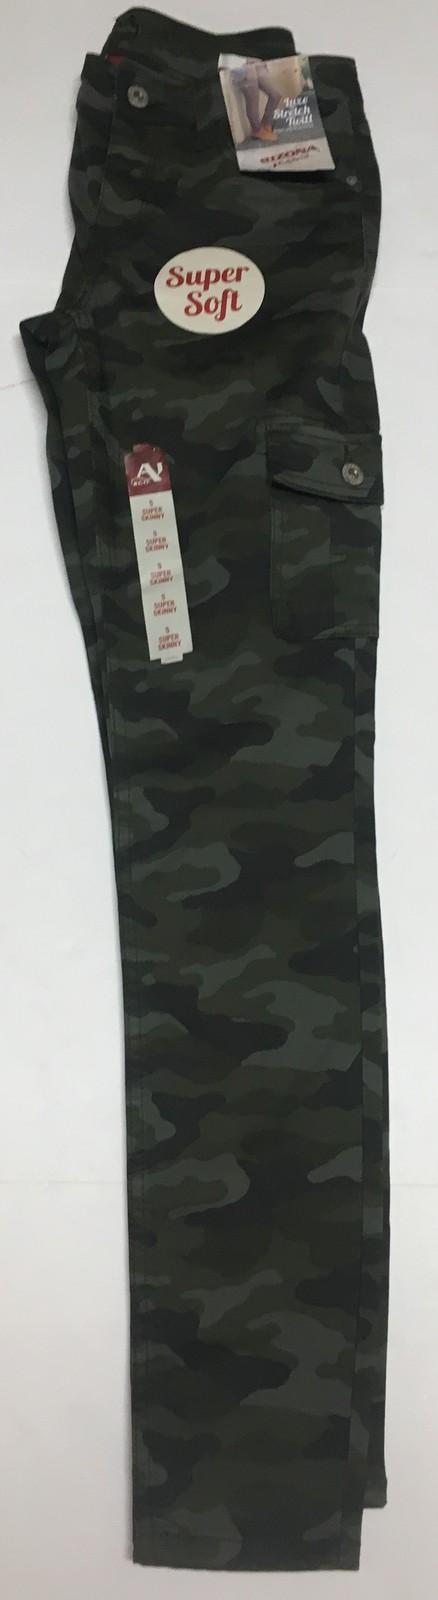 Arizona Camouflage Super Skinny Soft Stretch Pants Sz 5 image 7